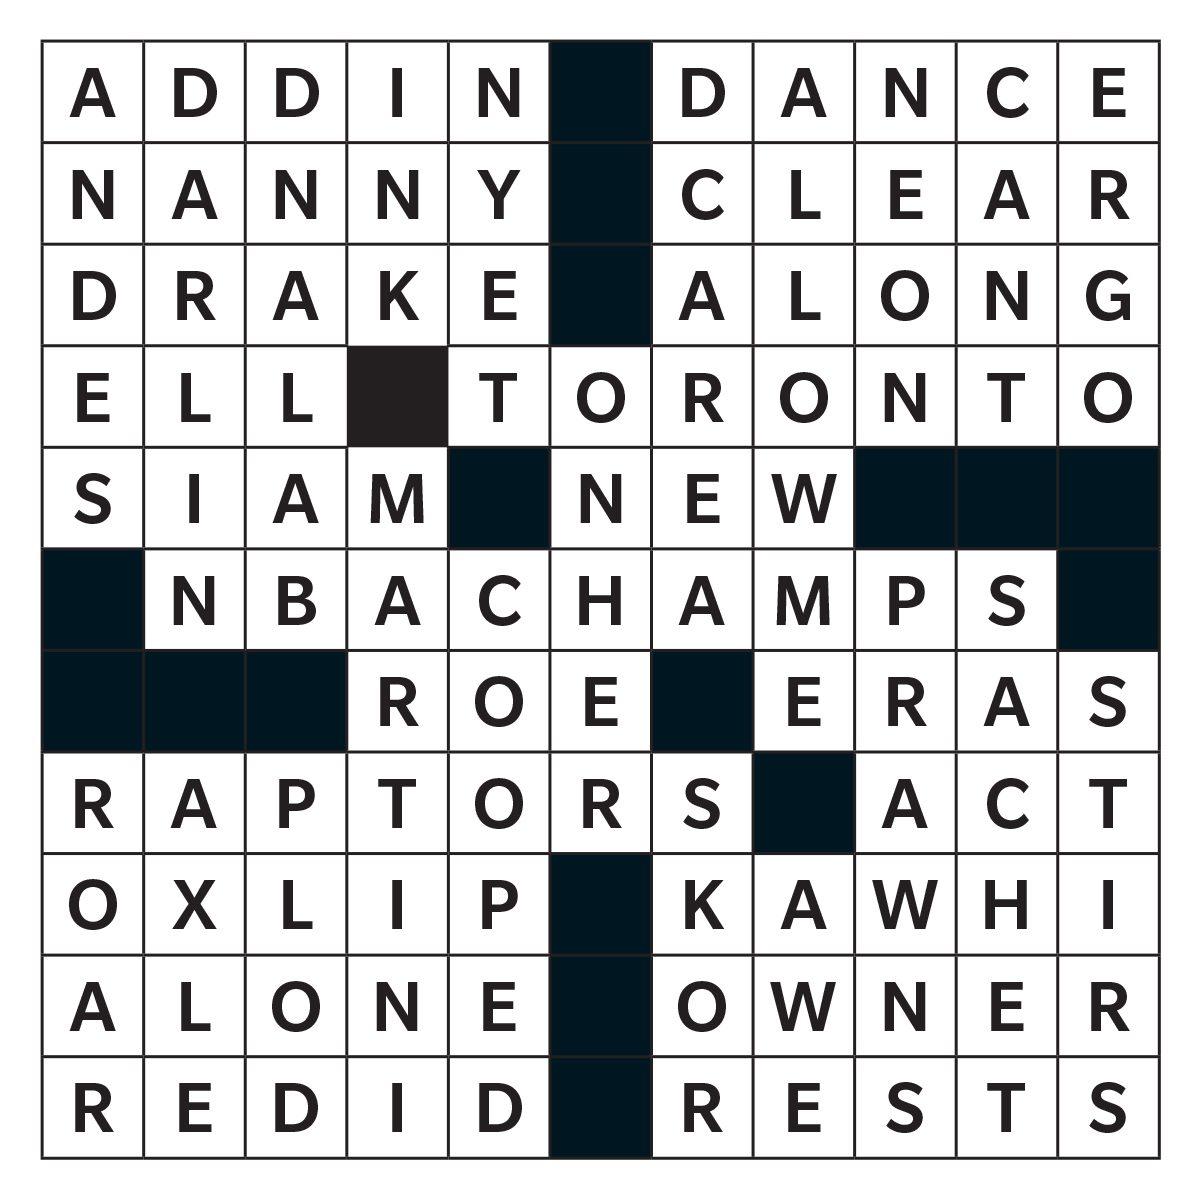 Printable crossword answer - April 2020